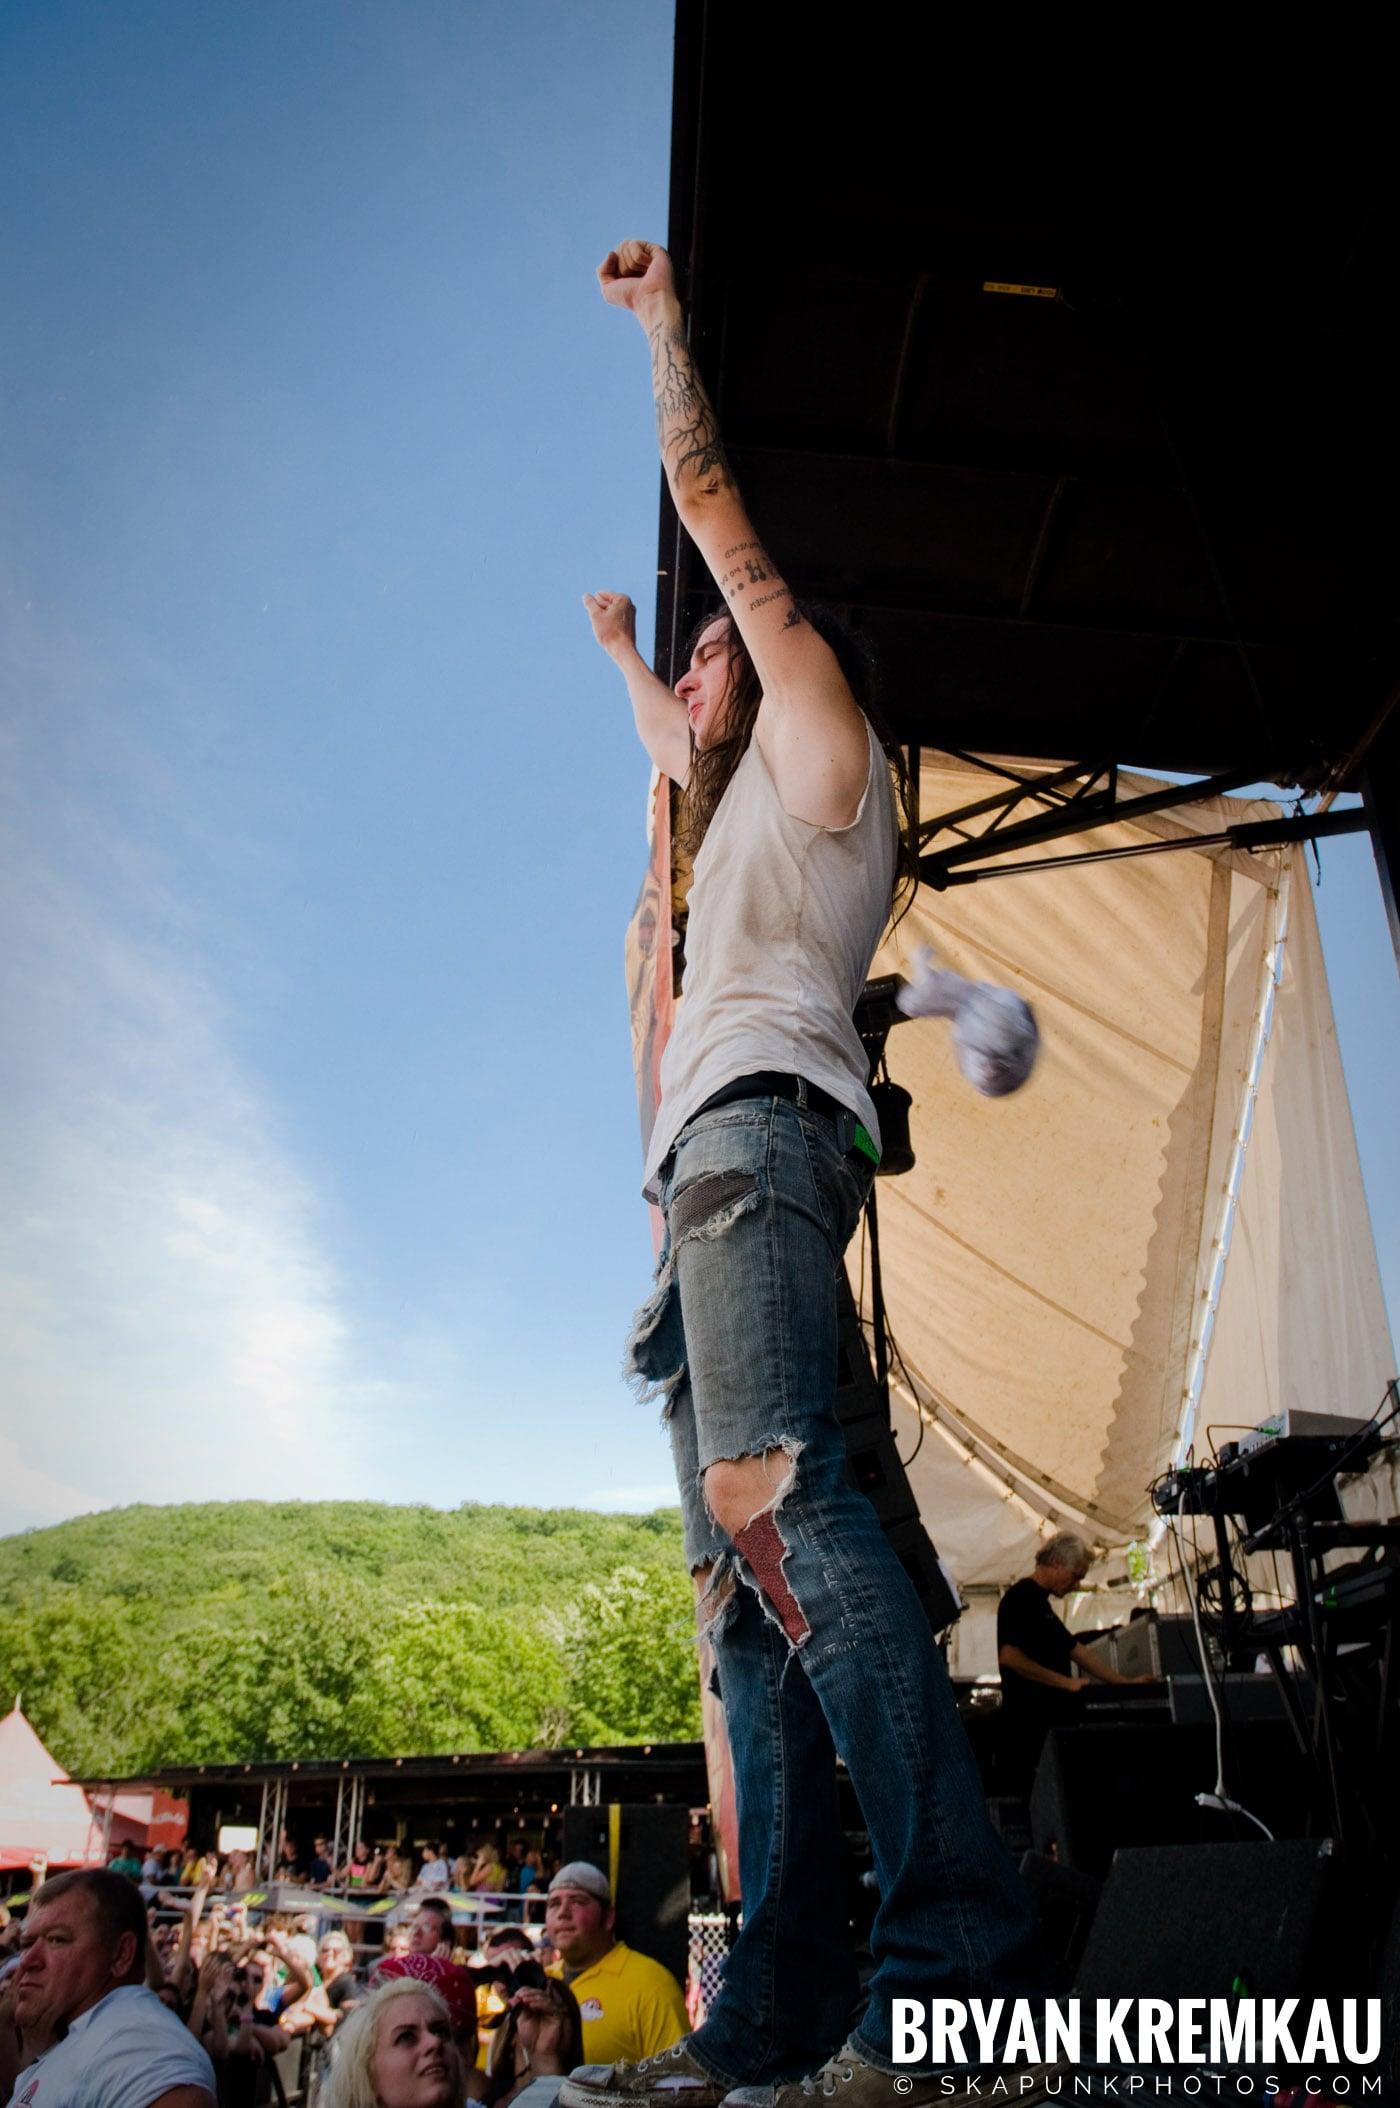 Underoath @ Warped Tour 2009, Scranton PA - 07.15.09 (13)